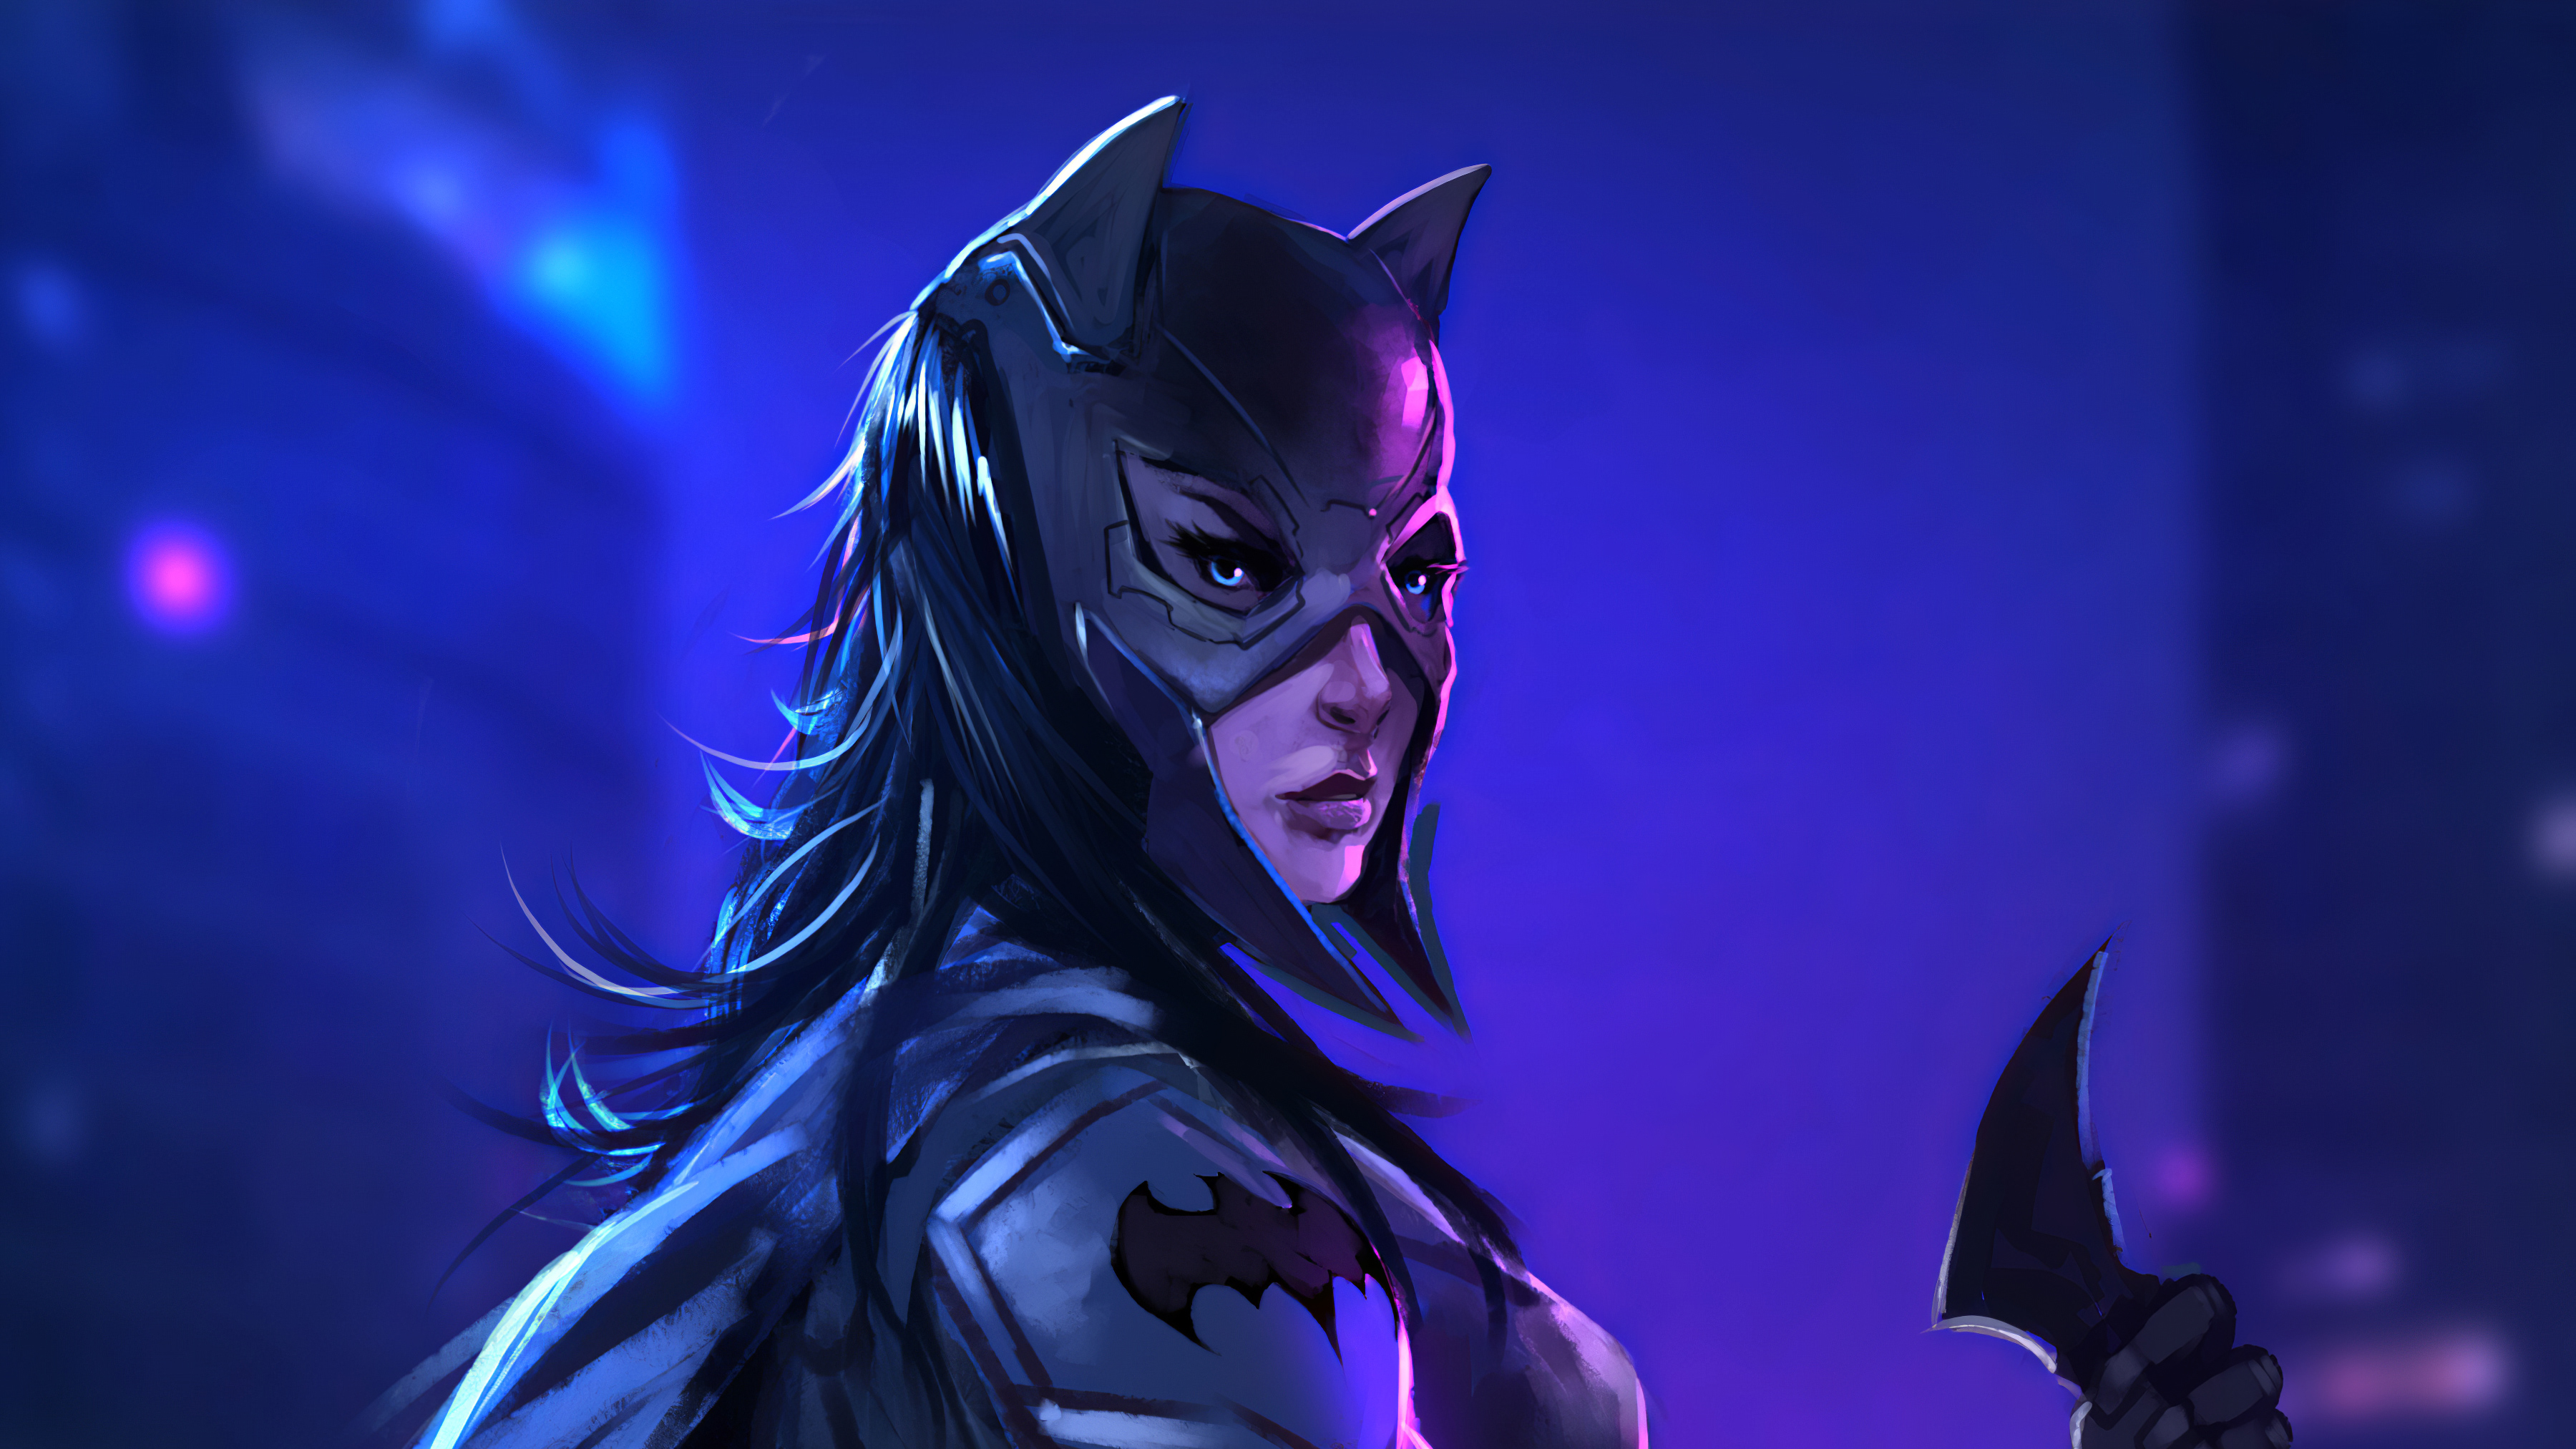 Fondos de pantalla Batwoman Artwork